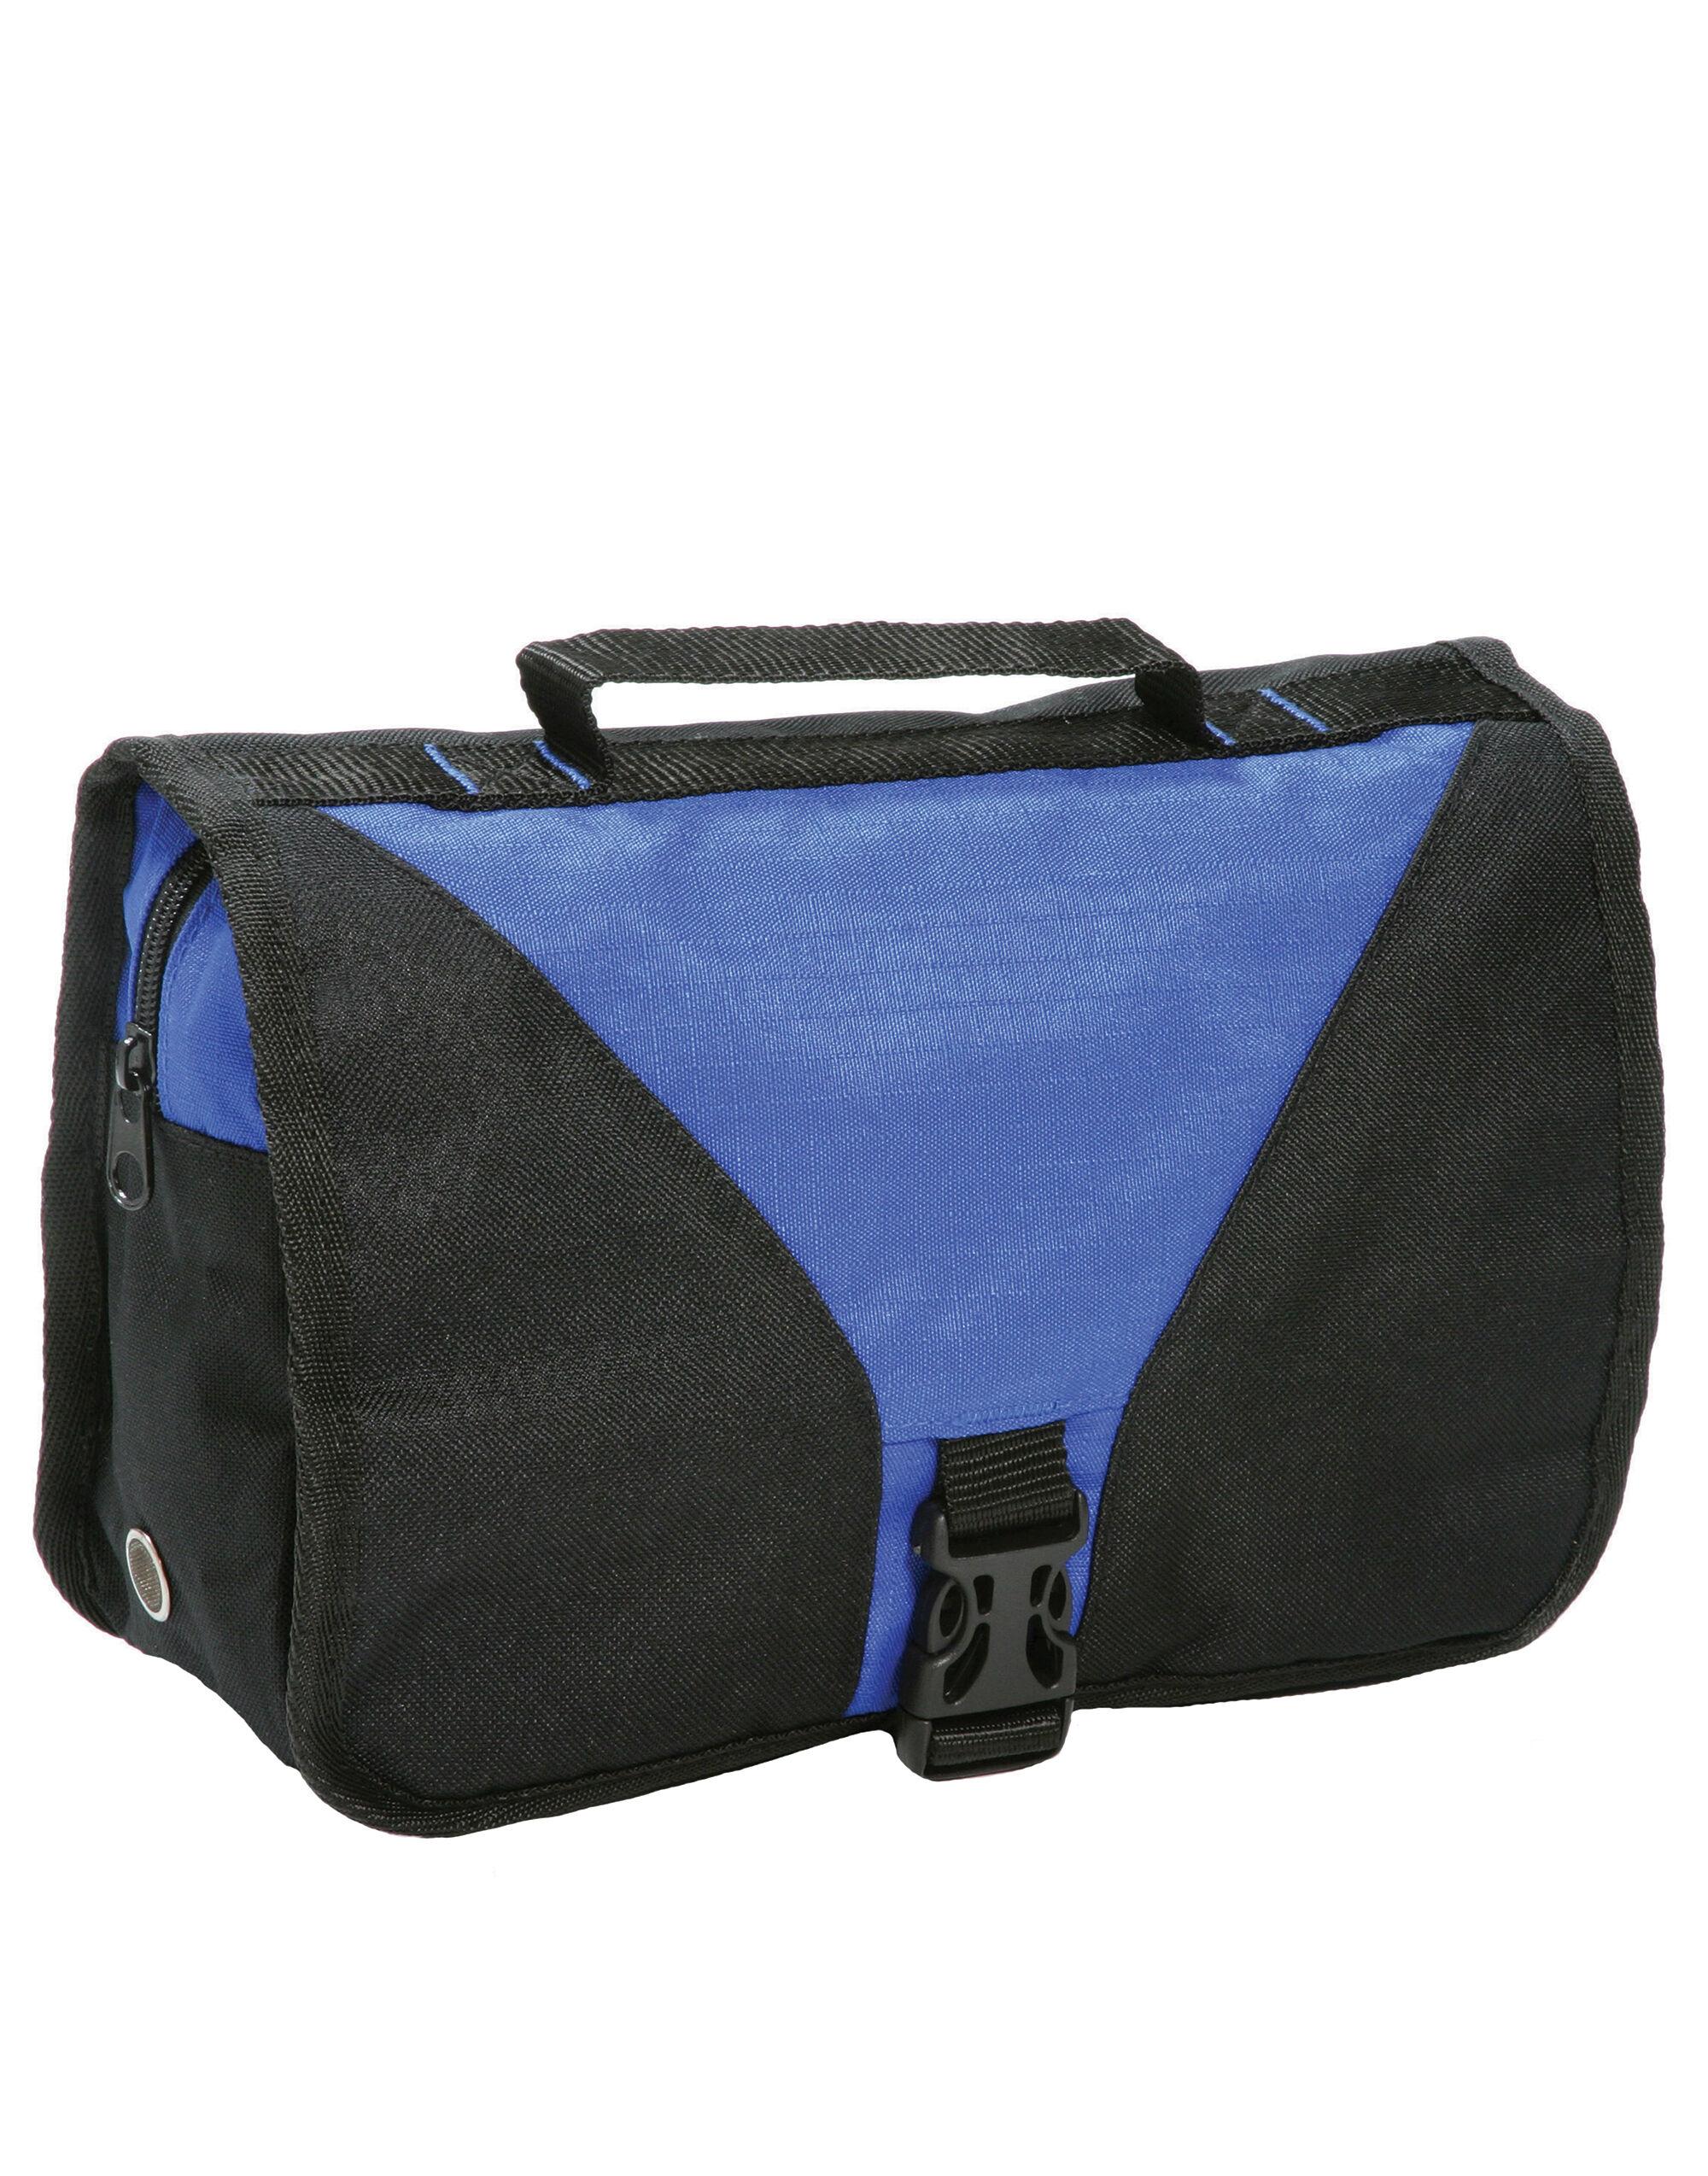 Bristol Folding Toiletry Bag